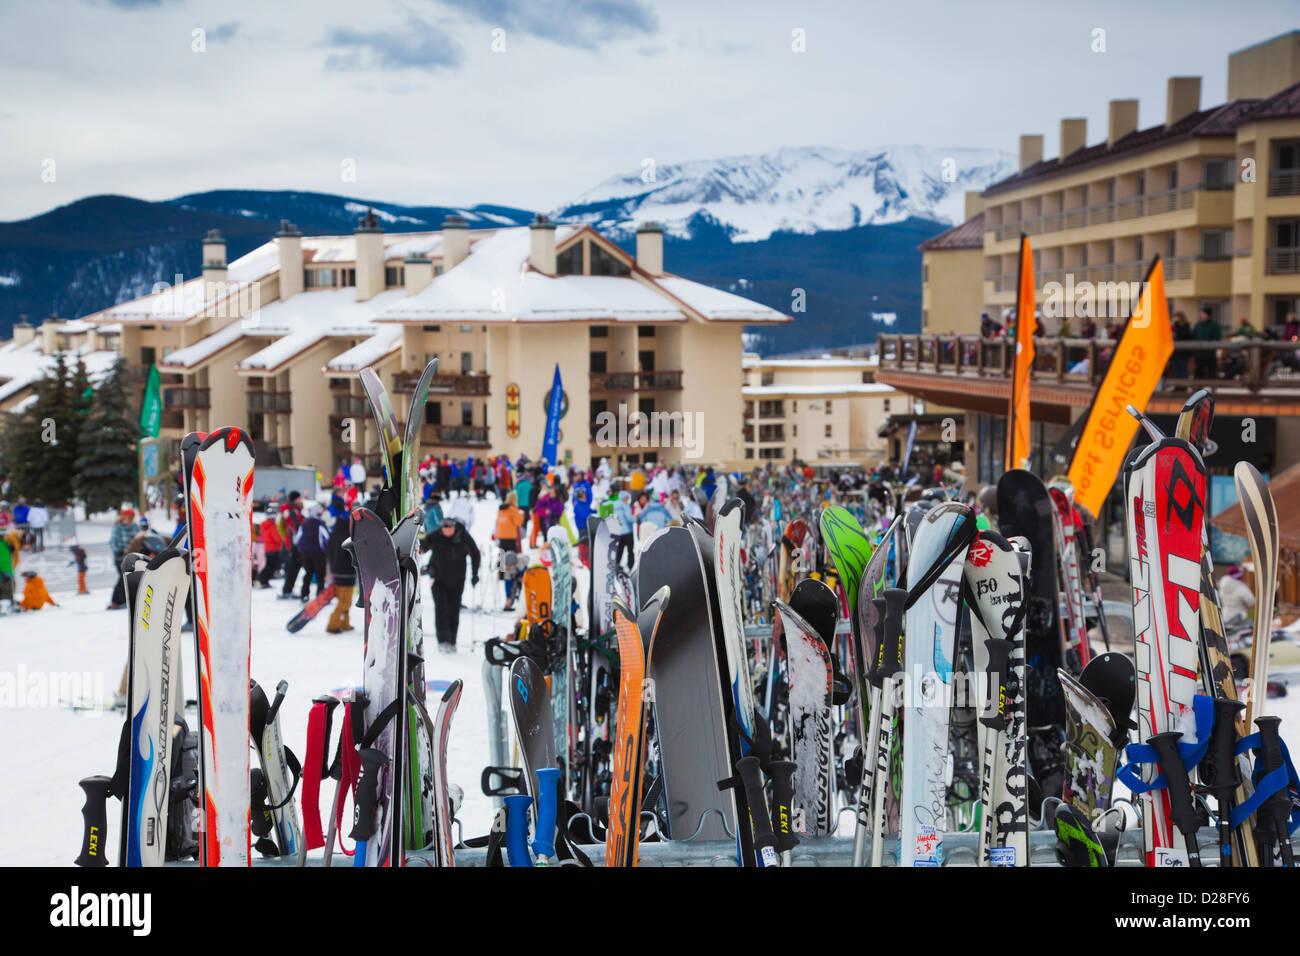 USA, Colorado, Crested Butte, Mount Crested Butte Ski Village, skis - Stock Image